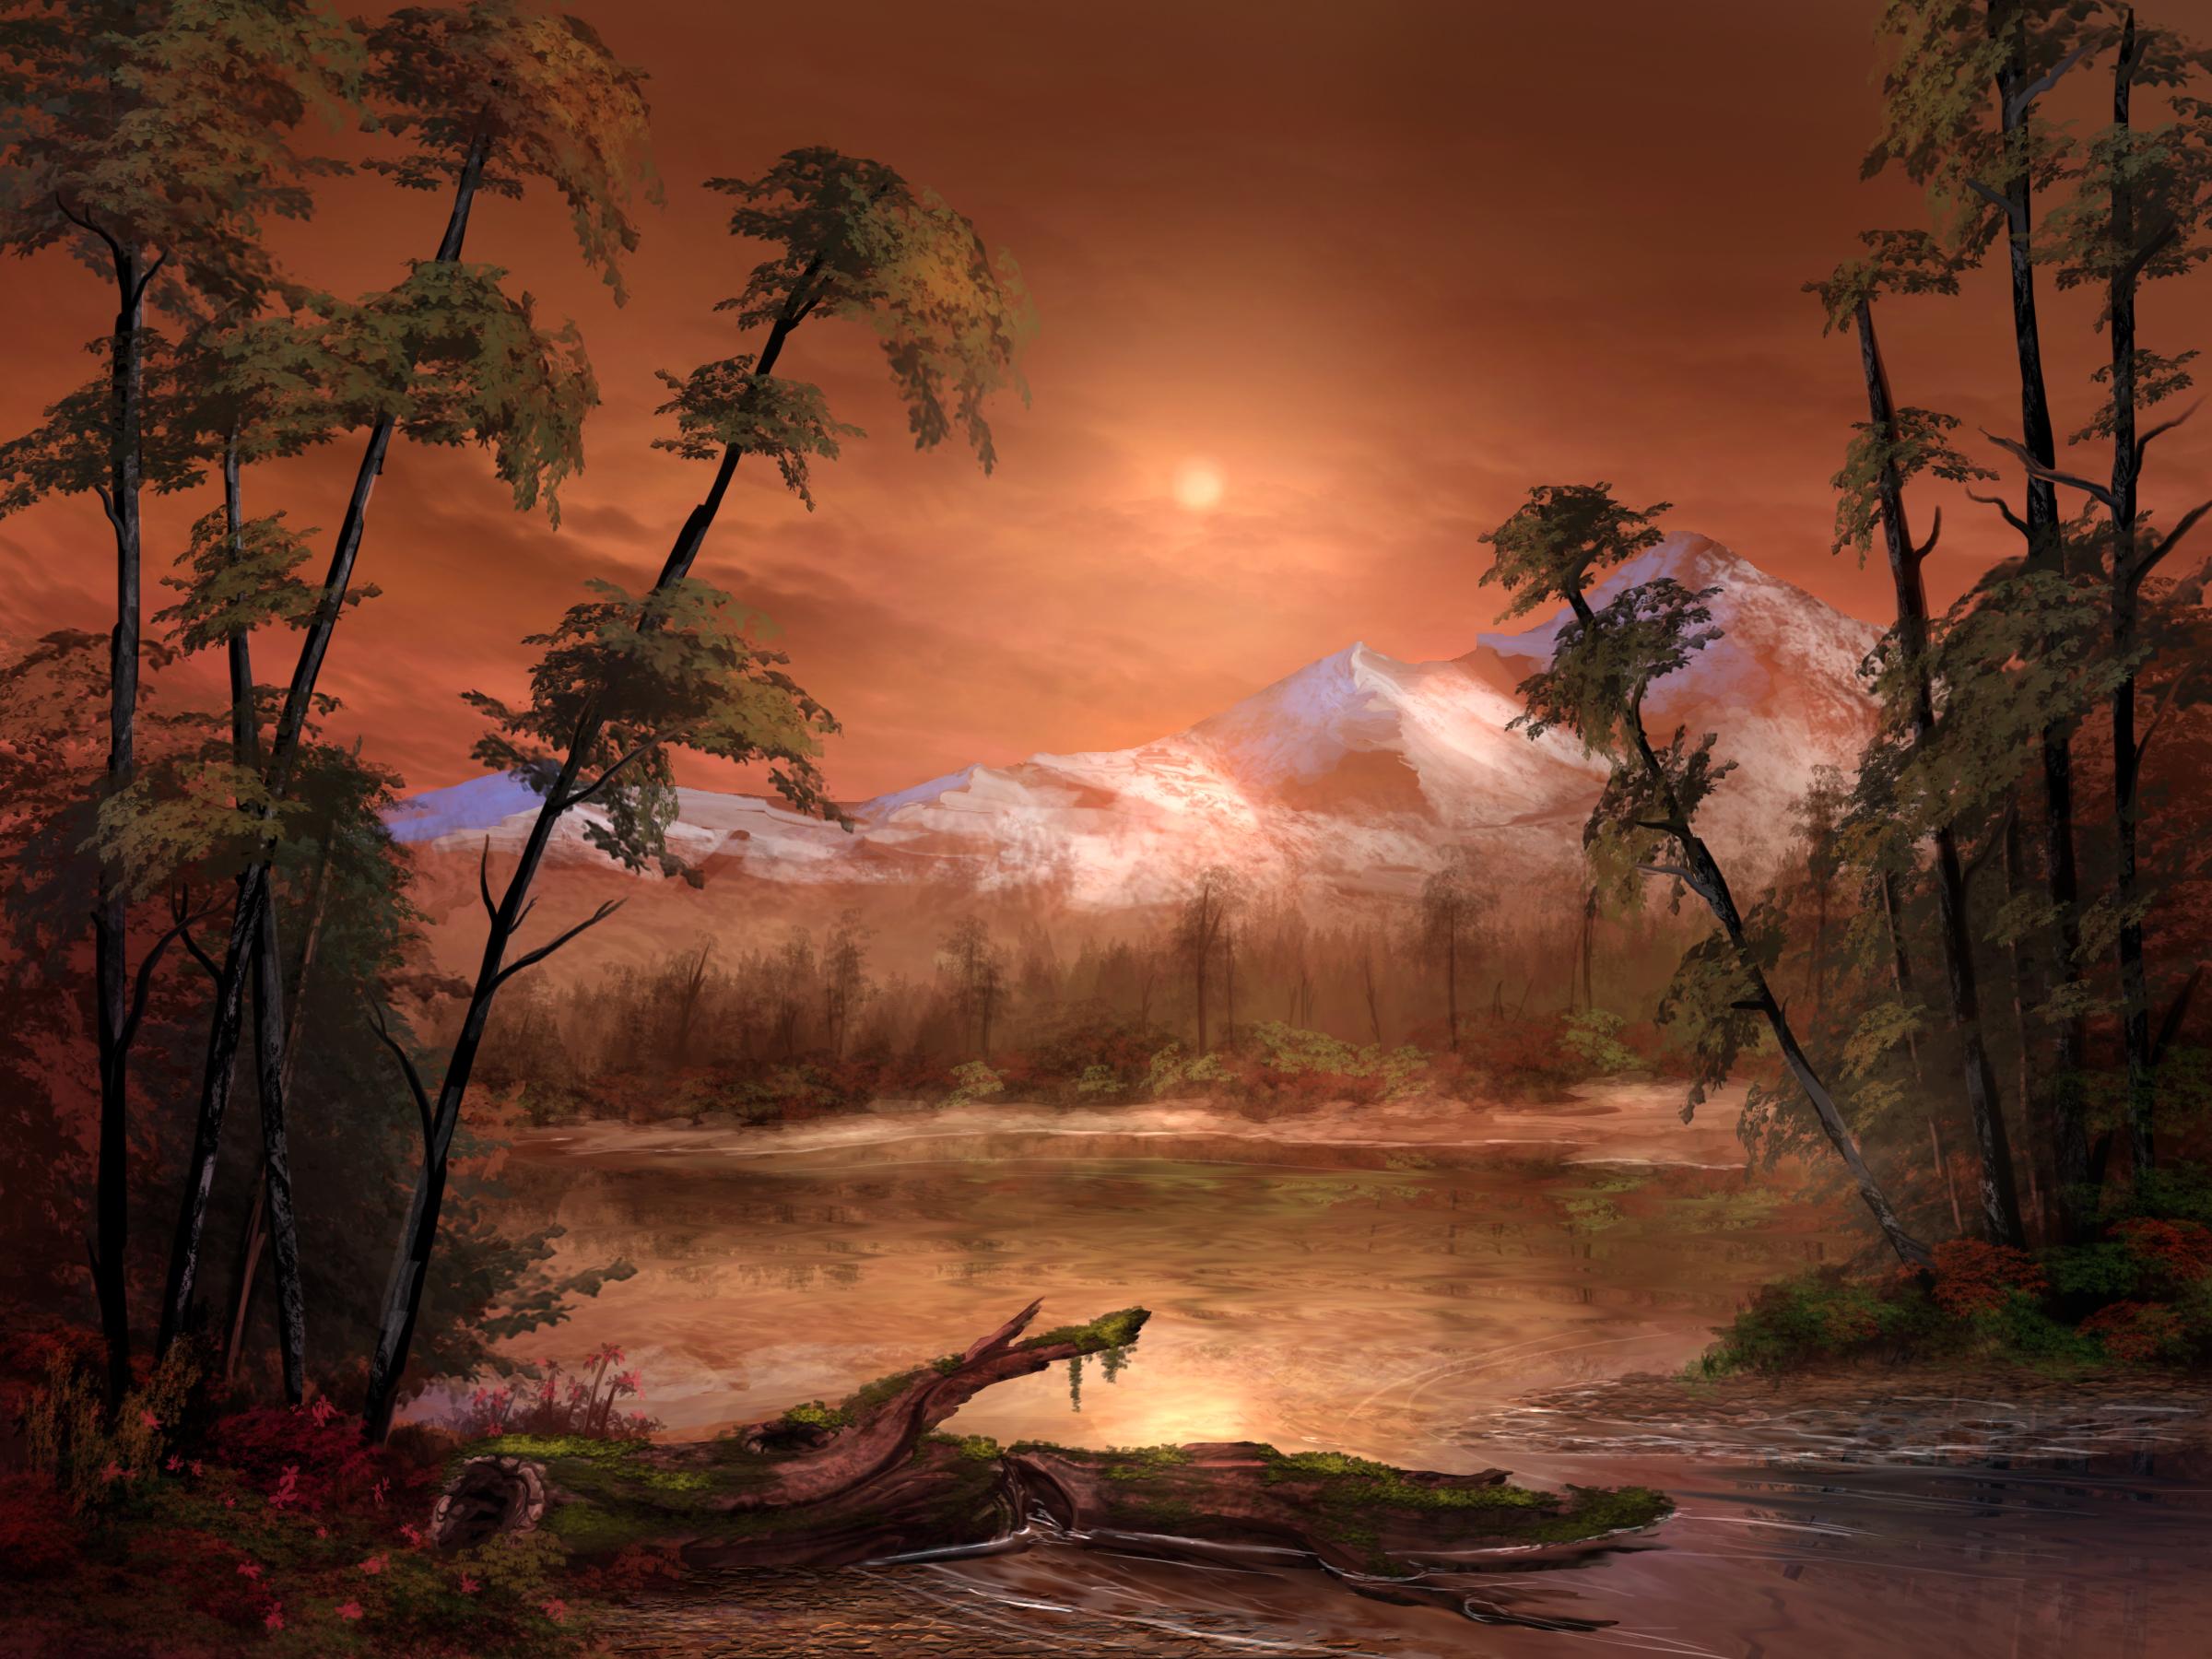 s1e24 - Beauty Is Everywhere, Autumn Fantasy